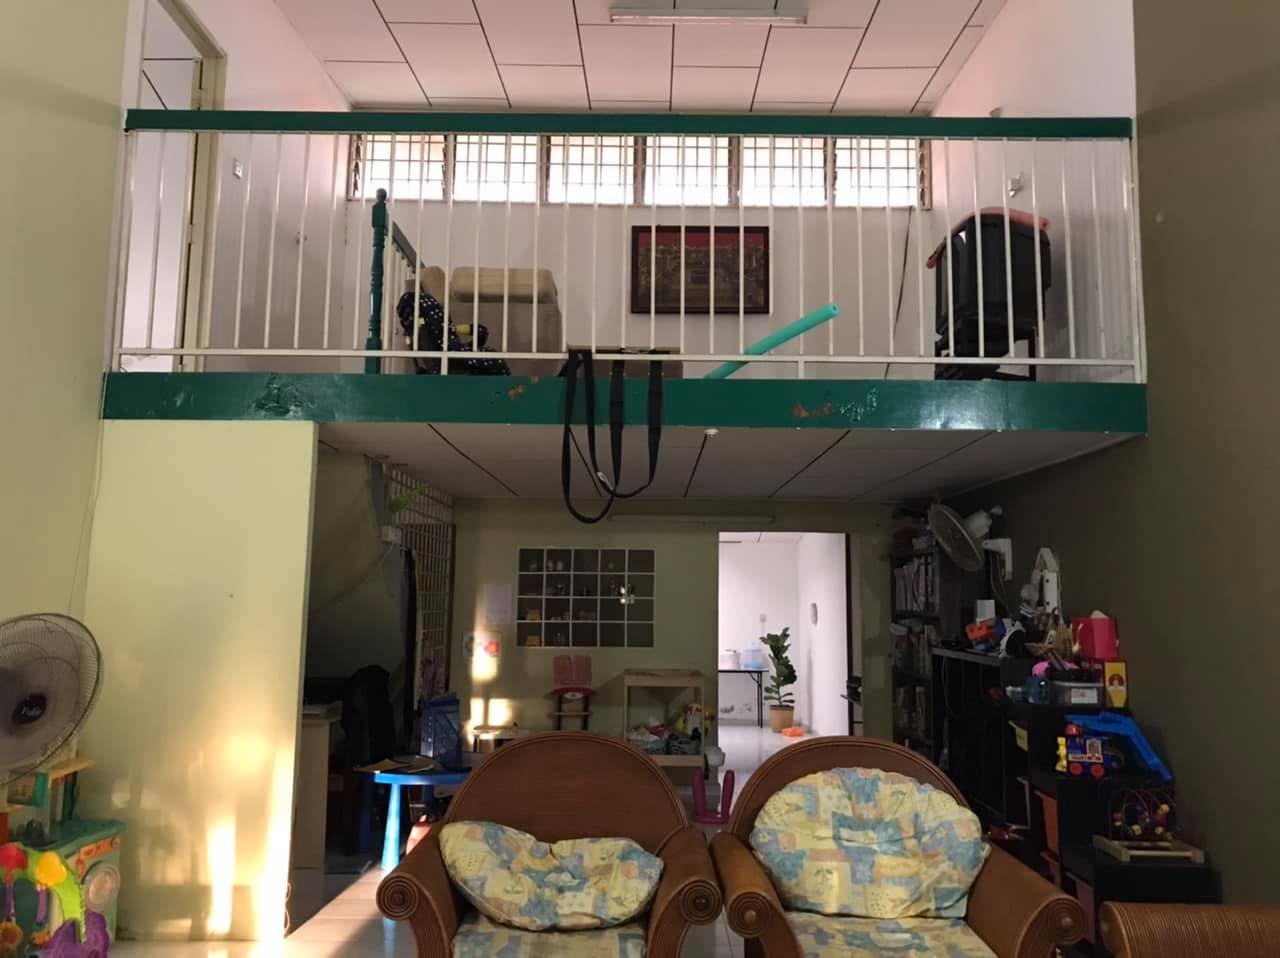 Cantiknya, Rumah Usia 30 Tahun Diberi 'Nafas Baru', Lotengnya Memang WOW!